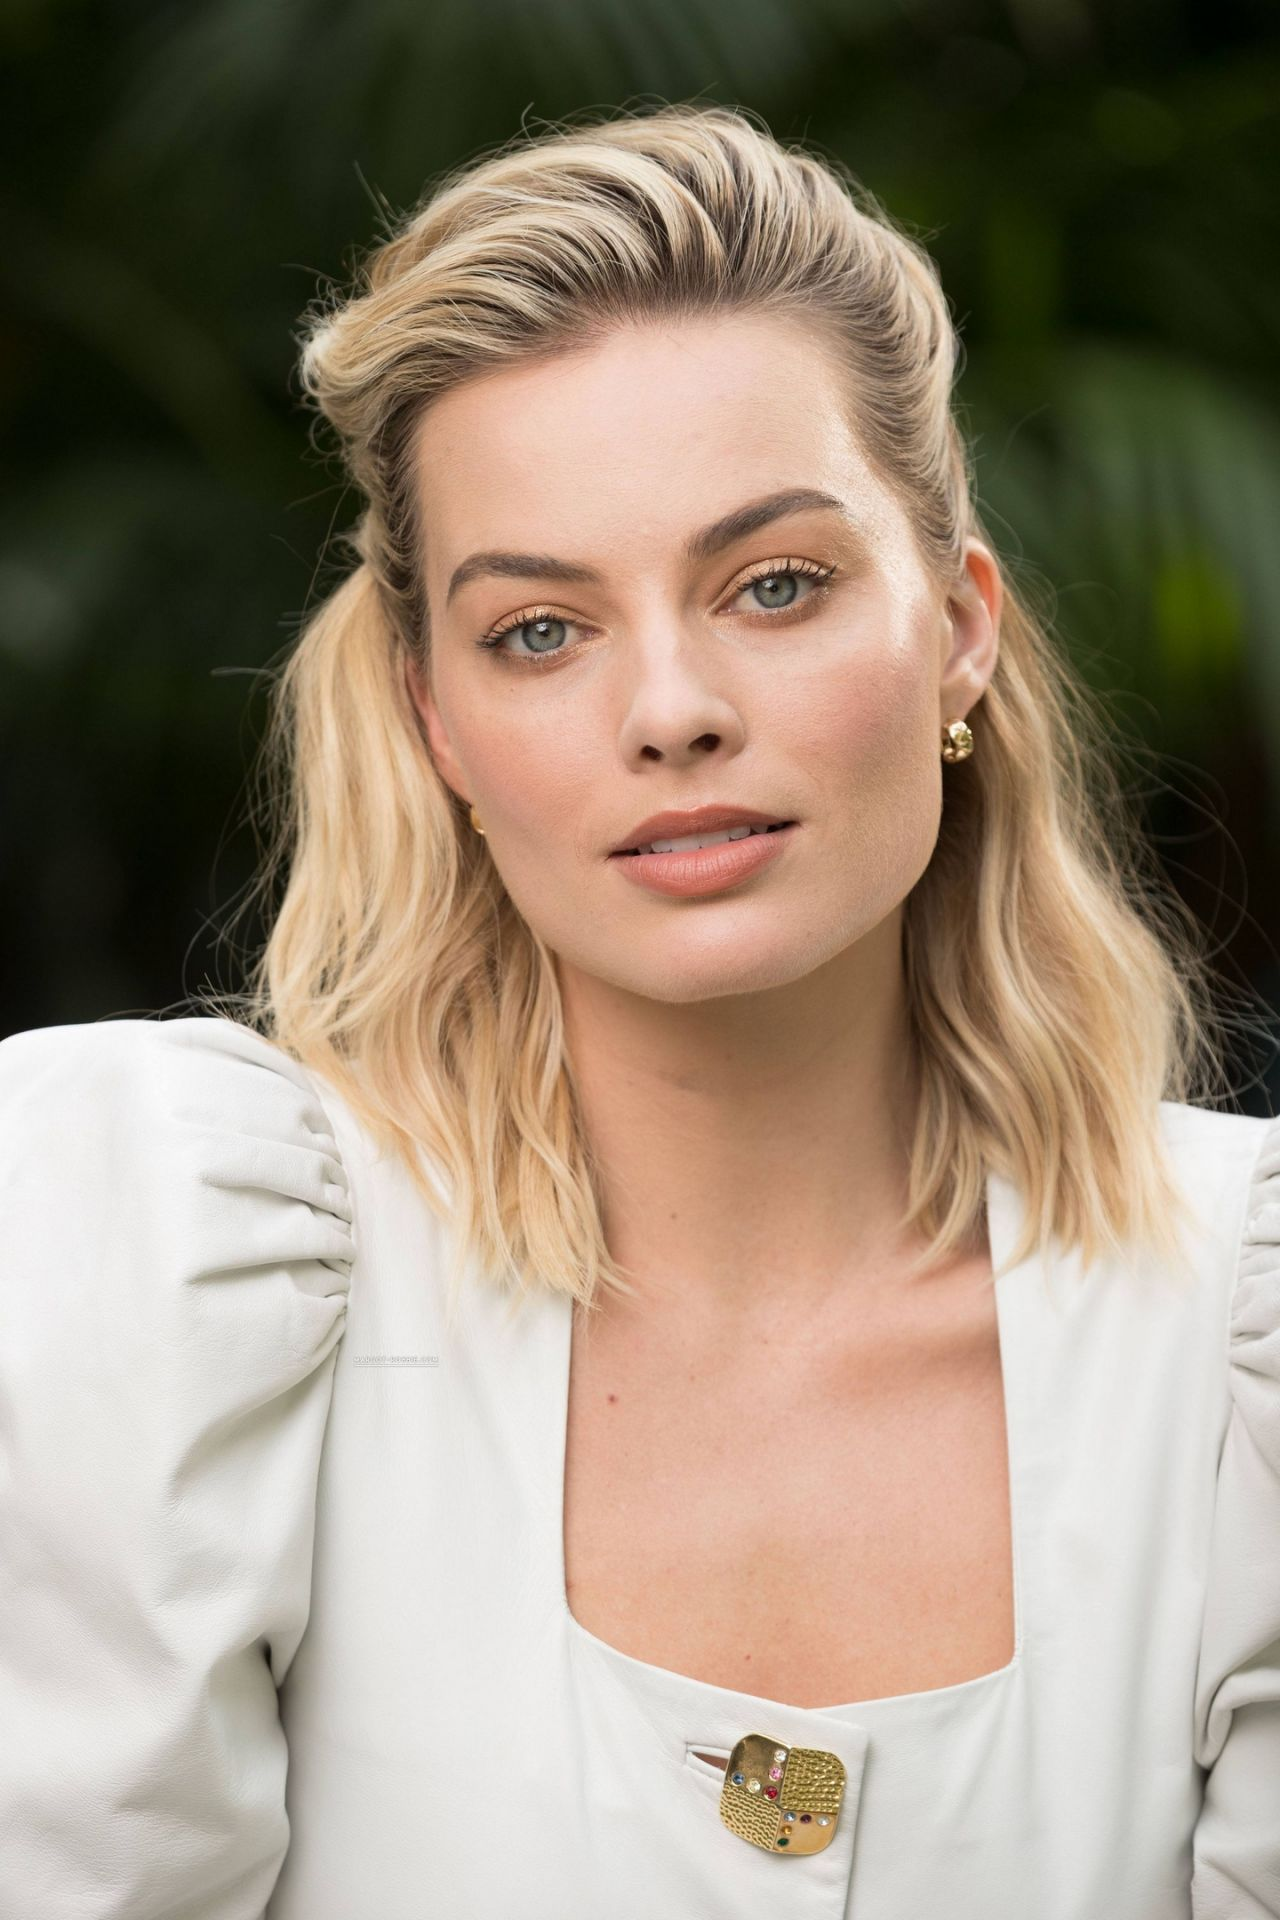 Margot Robbie Photoshoot For USA Today 2018 More Photos